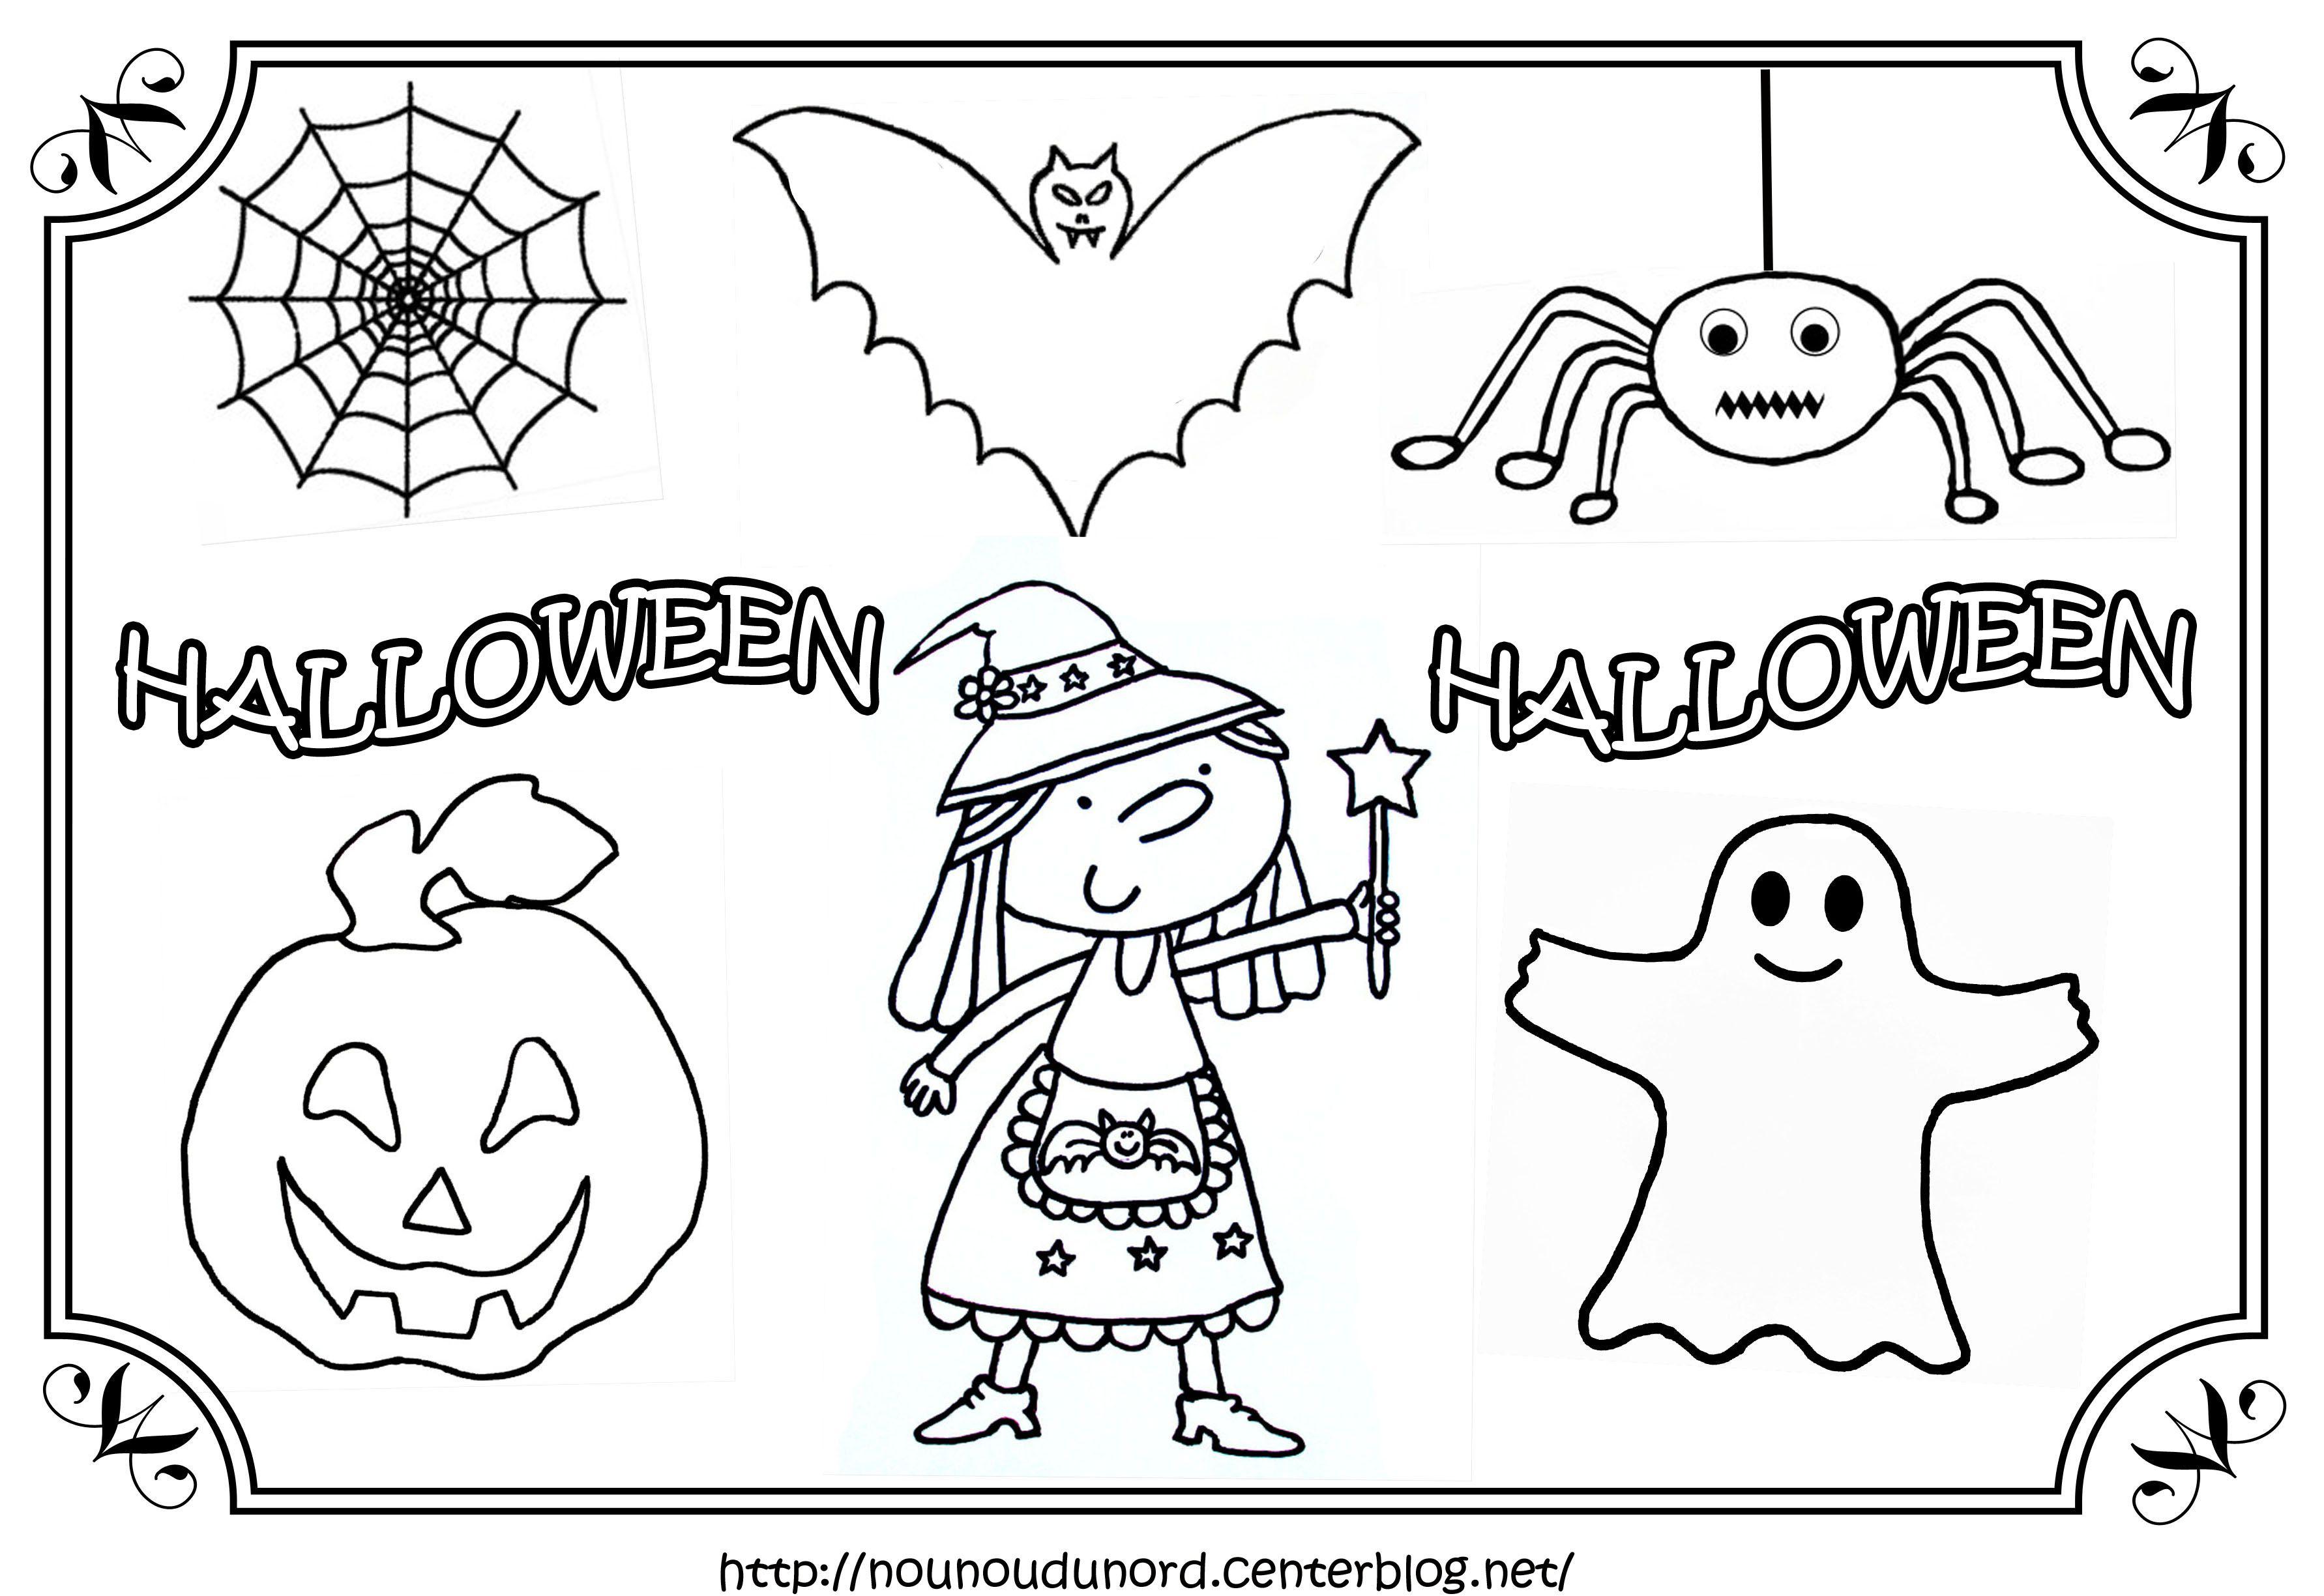 Coloriage gratuit halloween imprimer my blog - Coloriage halloween gratuit ...